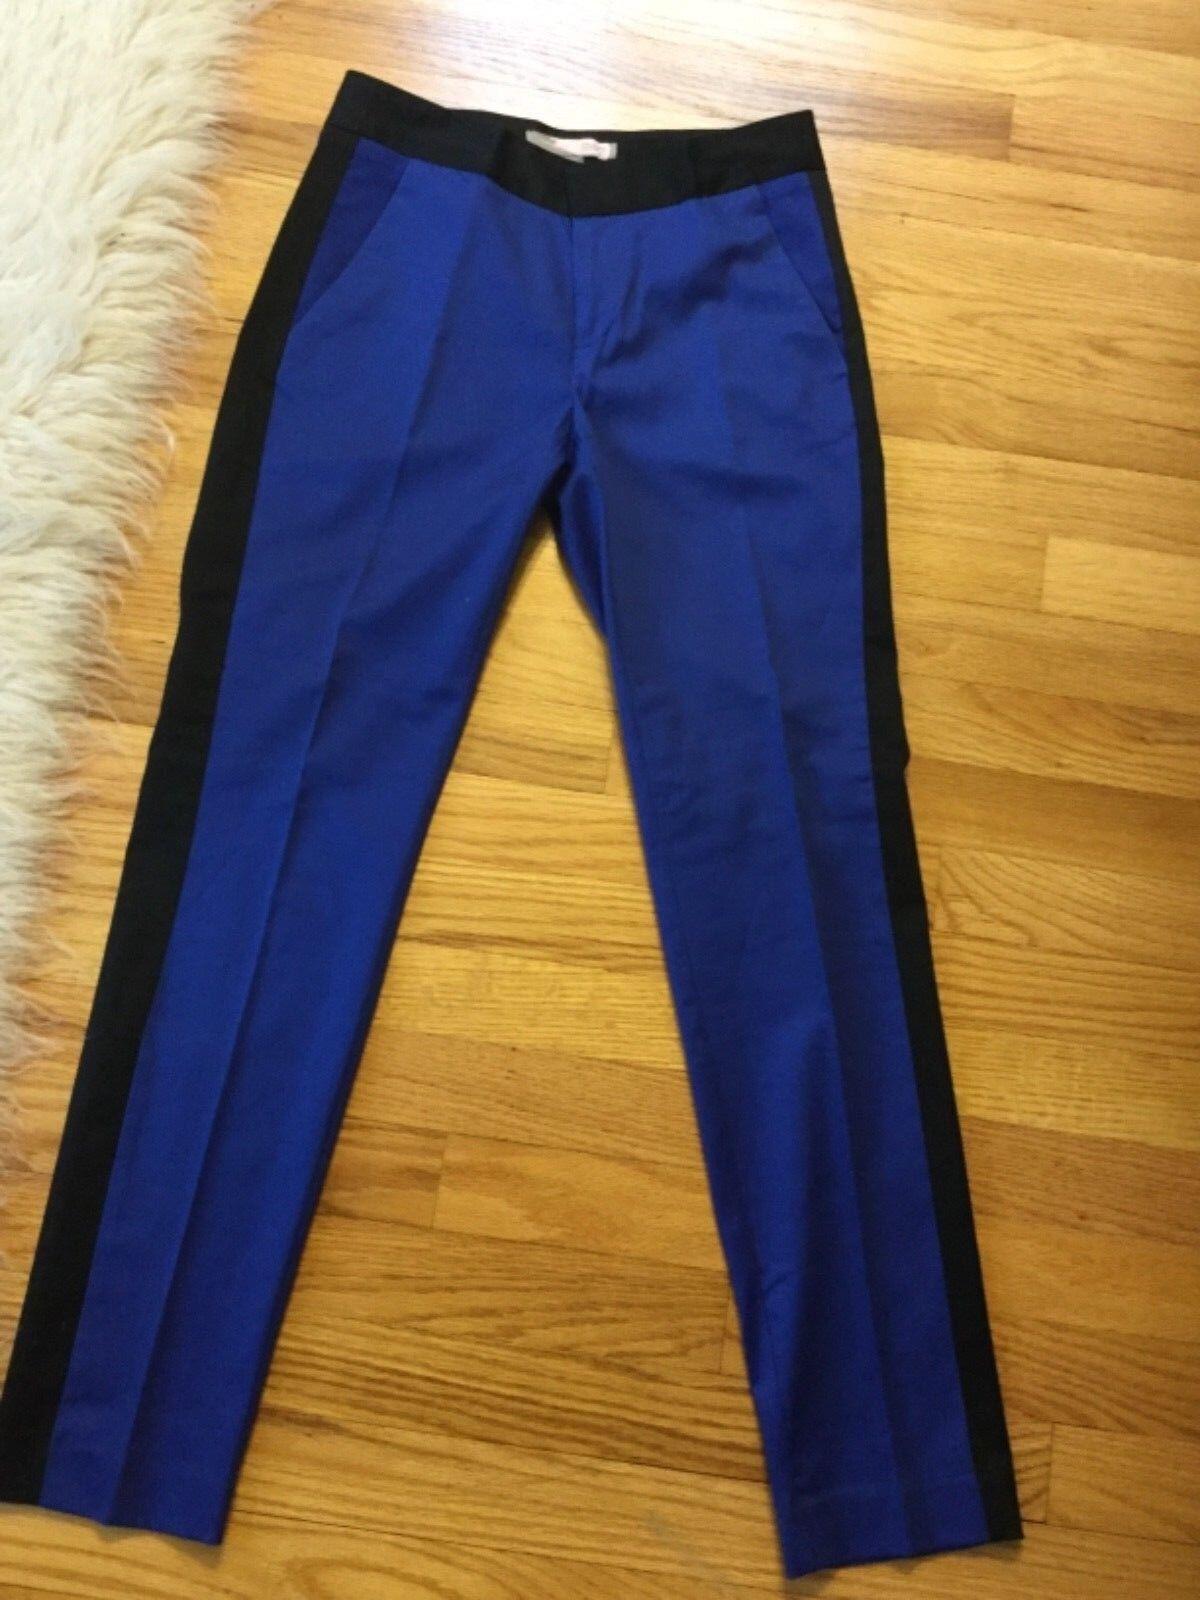 NWOT Forever 21 Blau tuxedo pants with schwarz stripe Größe XS